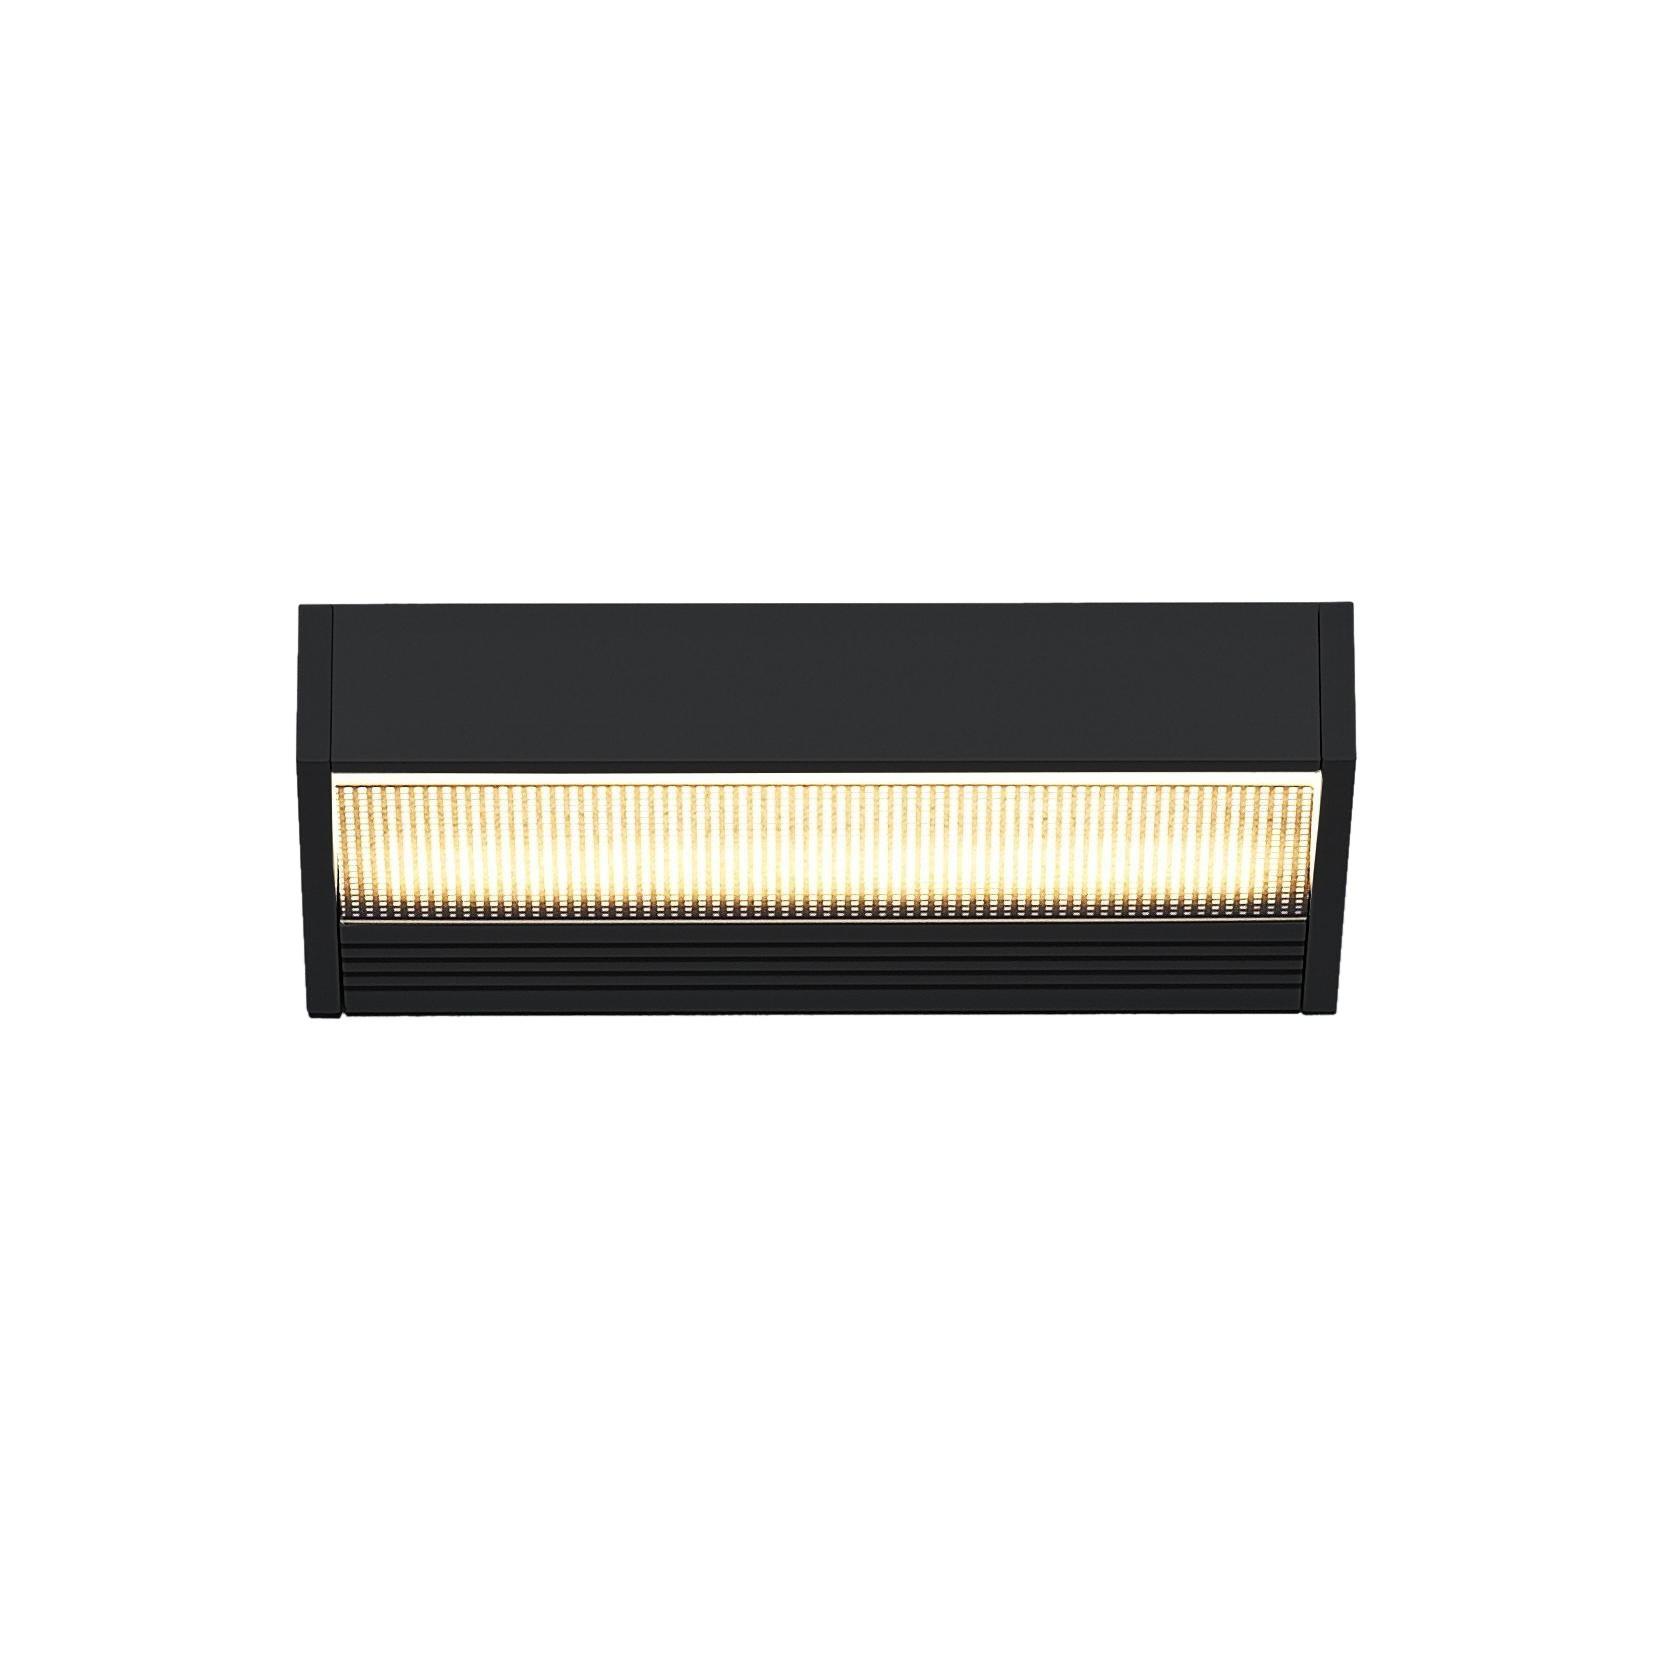 Serien SML LED Wandlamp zwart small